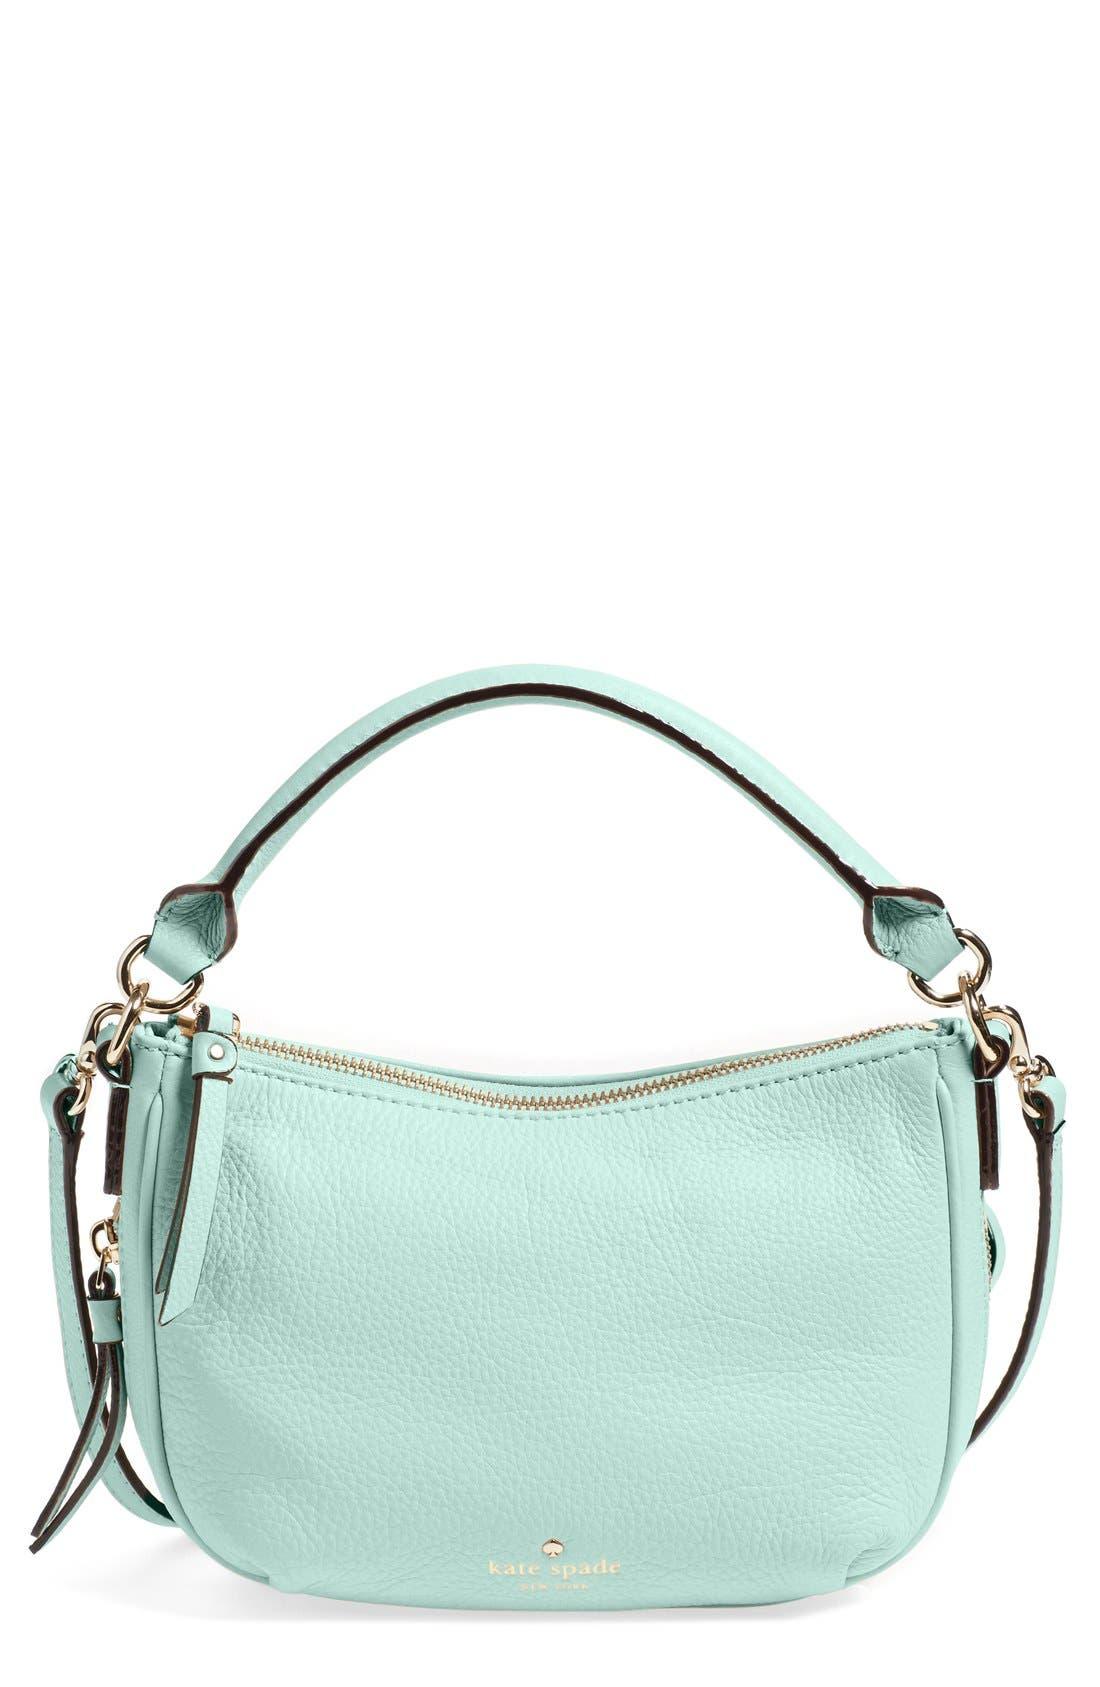 Alternate Image 1 Selected - kate spade new york 'cobble hill - mini ella' leather crossbody bag